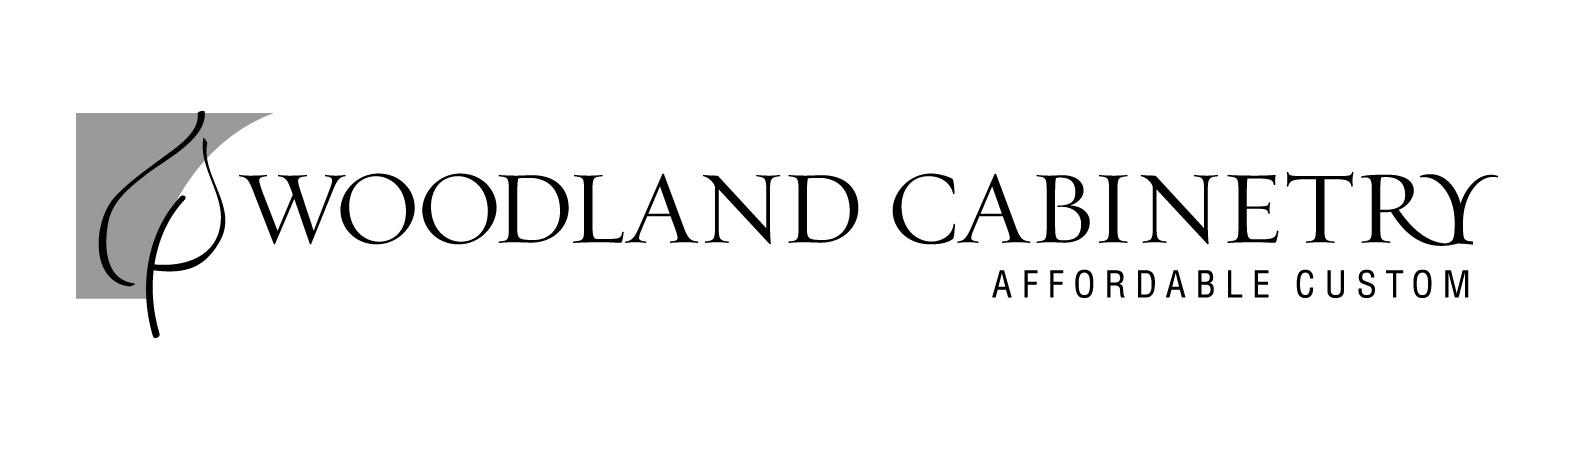 WoodlandCabinetry_logo2009_color.jpg